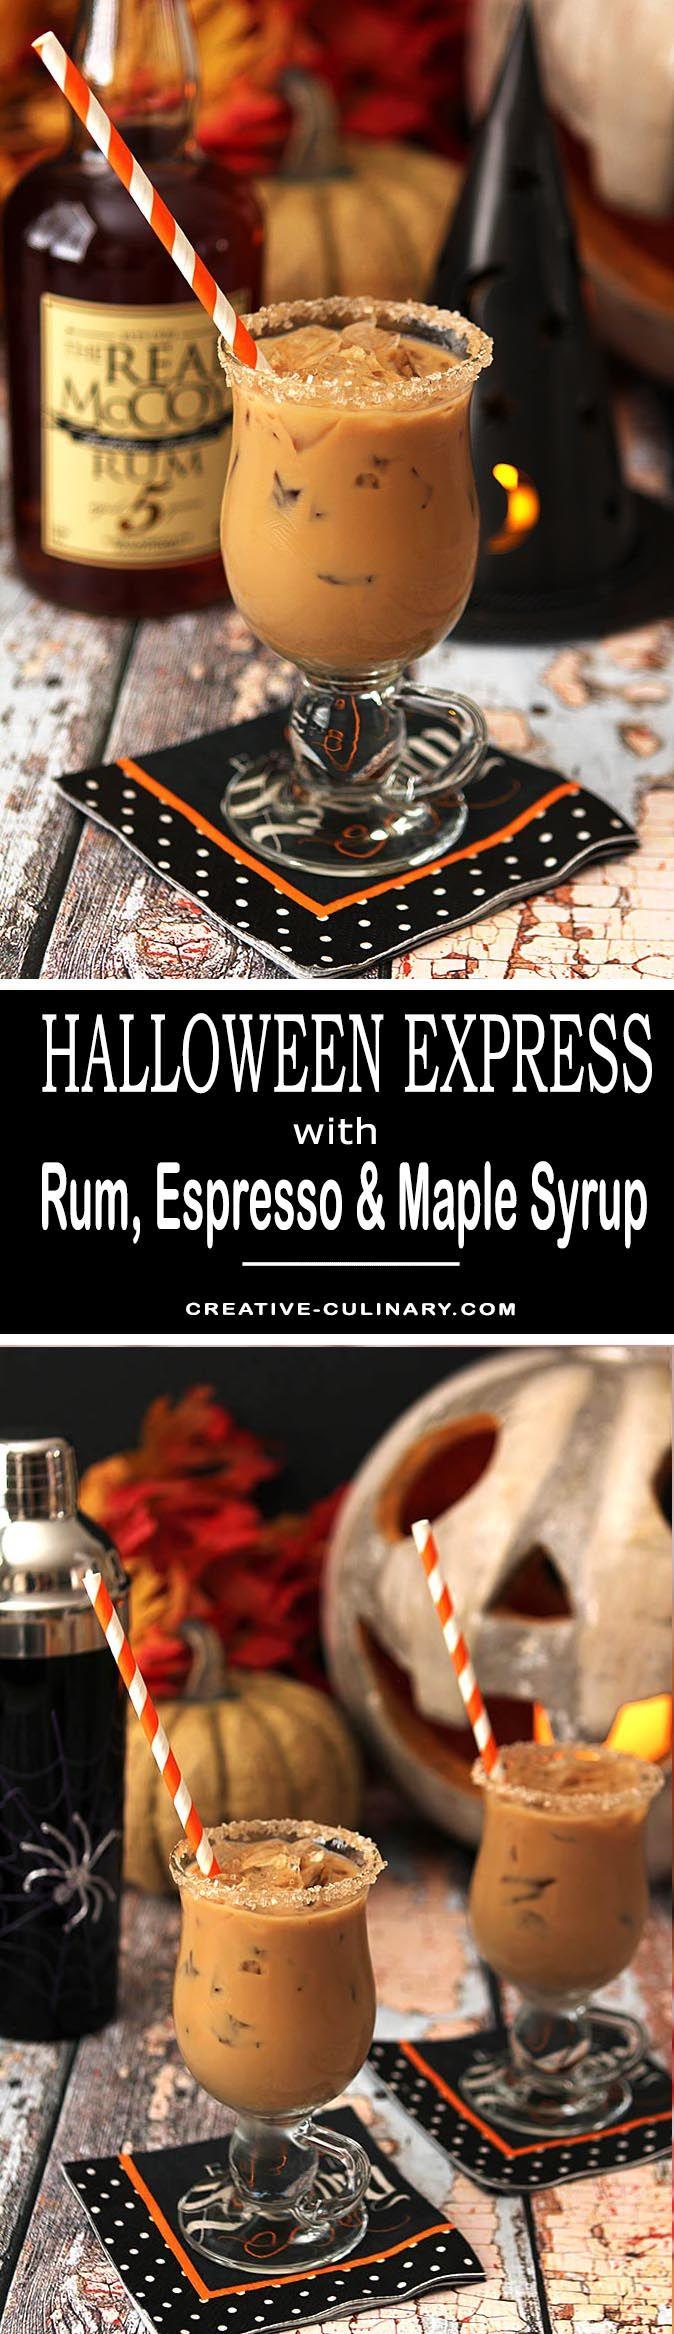 Best 25+ Halloween express ideas on Pinterest   Ingredients for ...